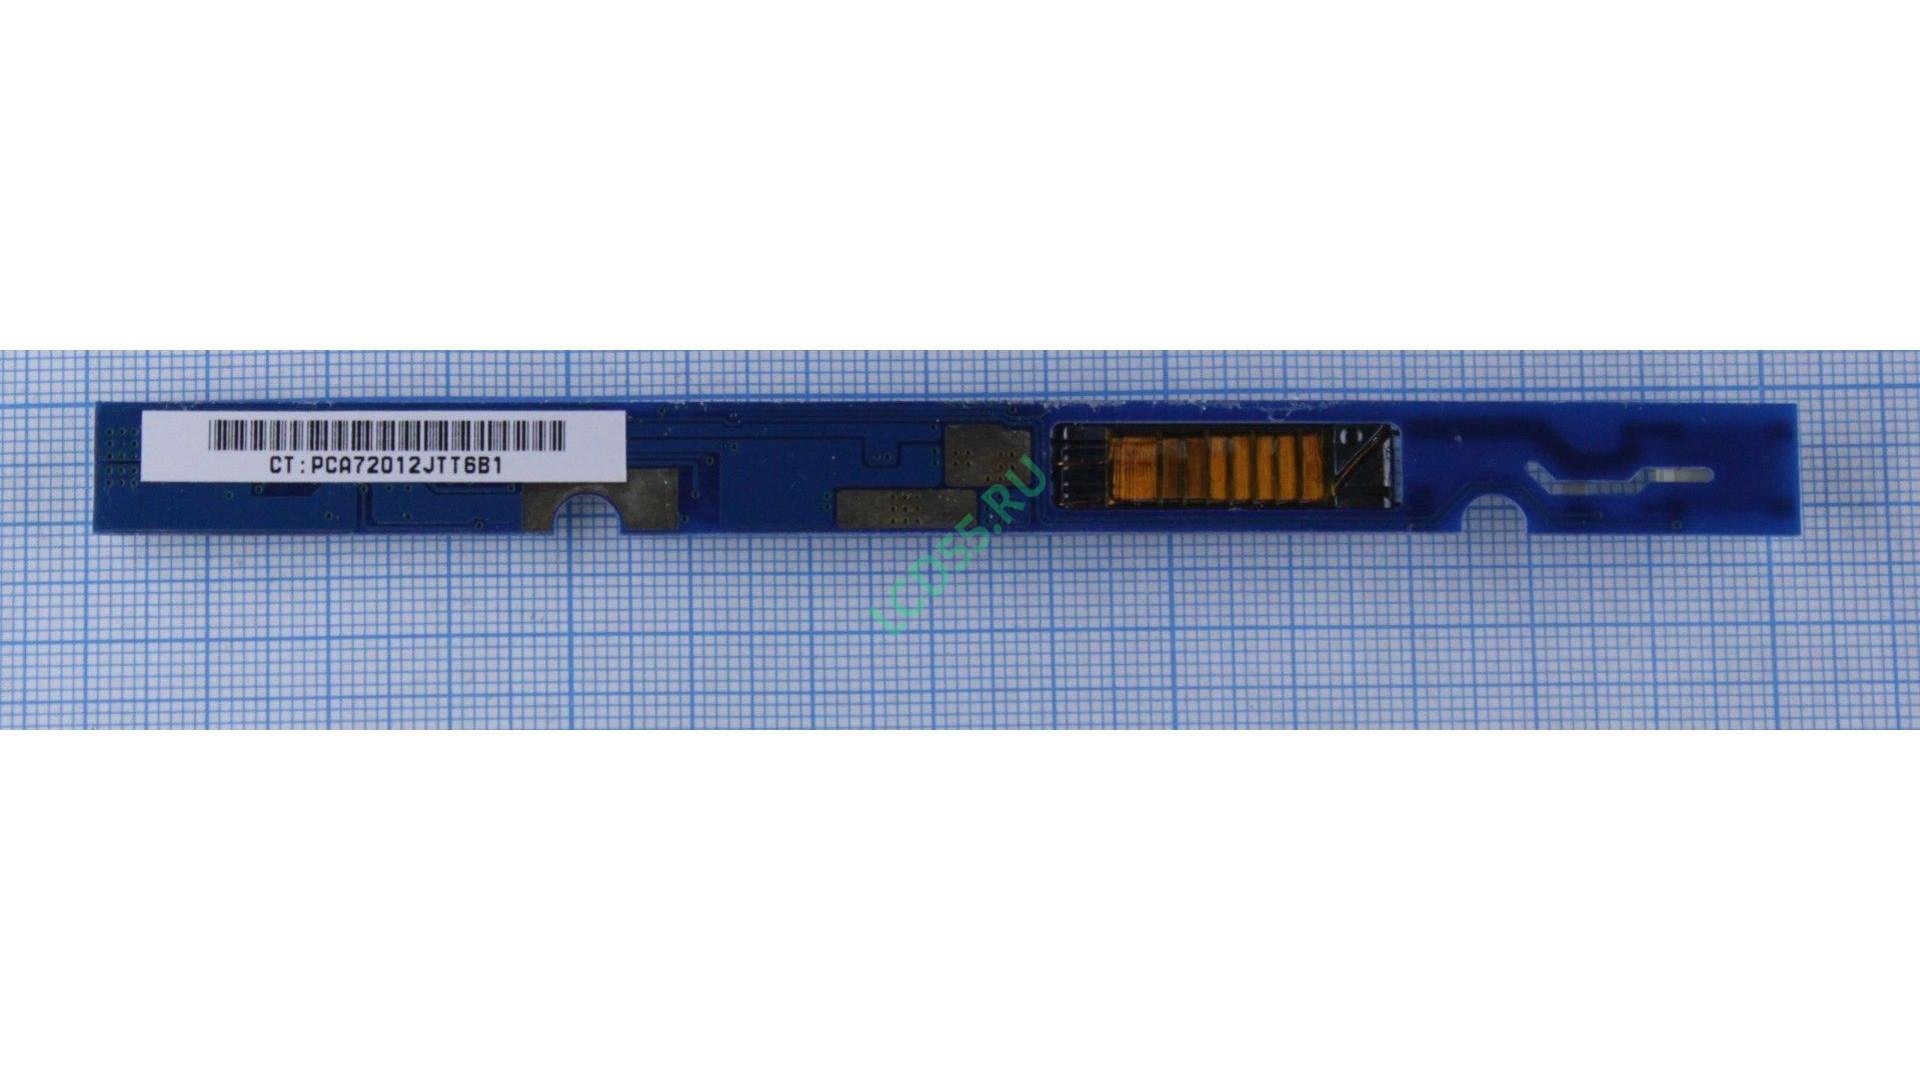 Инвертор HP Compaq NX7400, NX7300, NX6110, NC6220, 6735s, 6730s